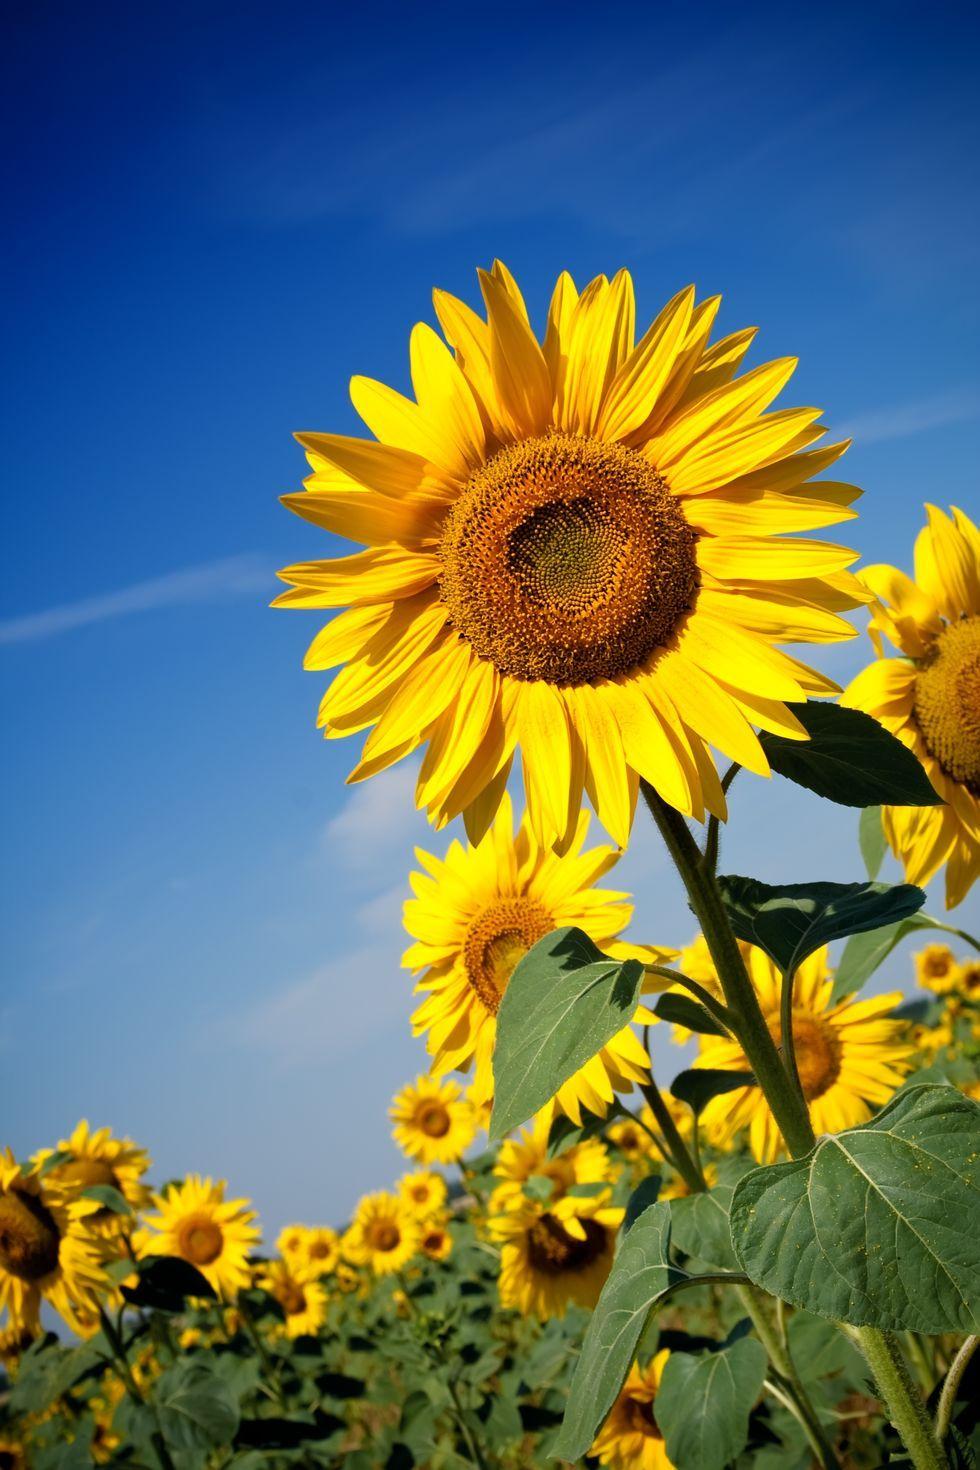 Sunflowers - Flower Meanings